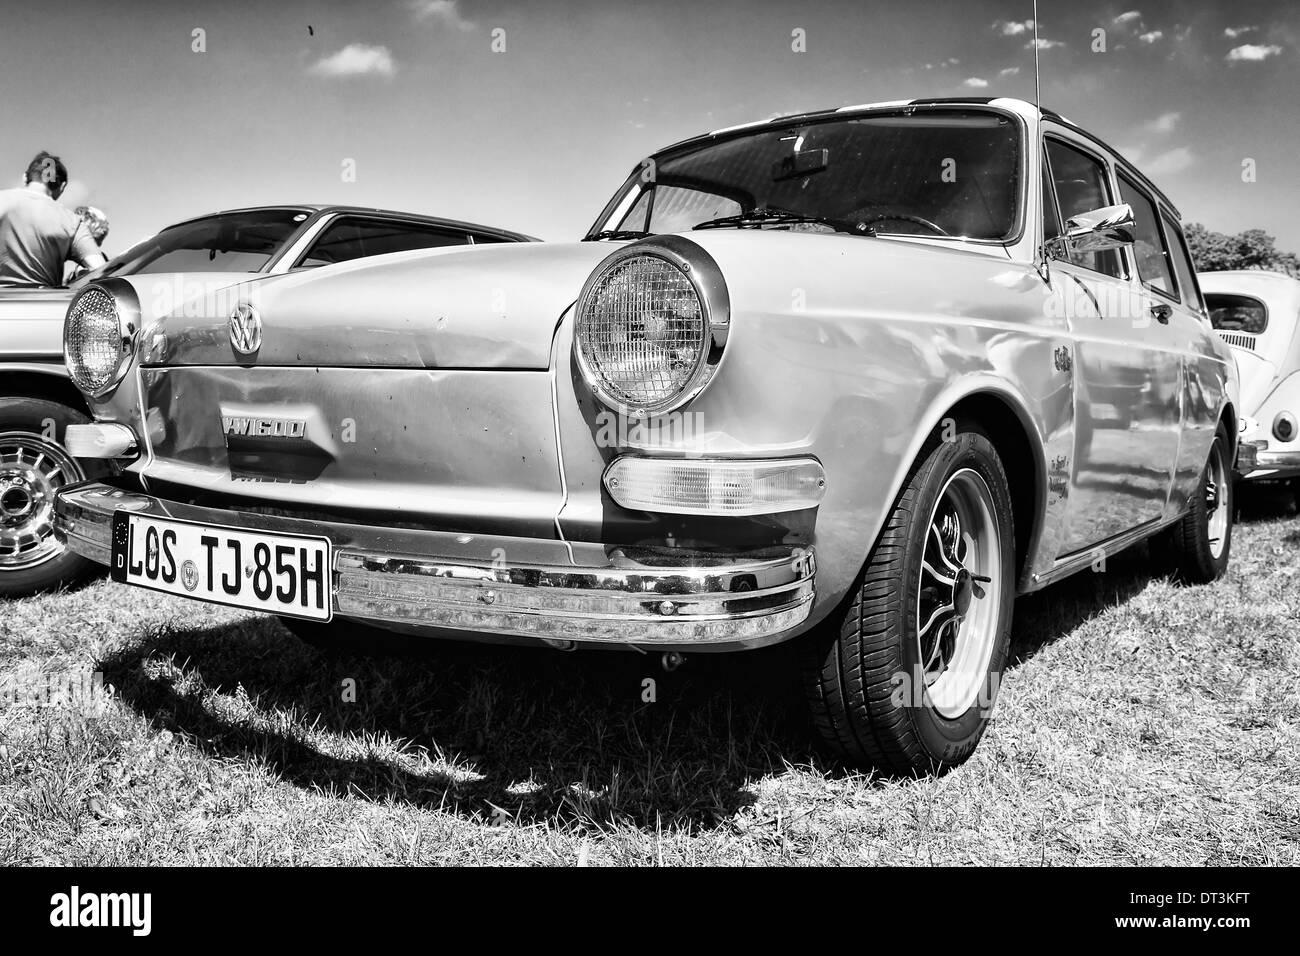 Compact car Volkswagen 1600 Variant ('Squareback') - Stock Image